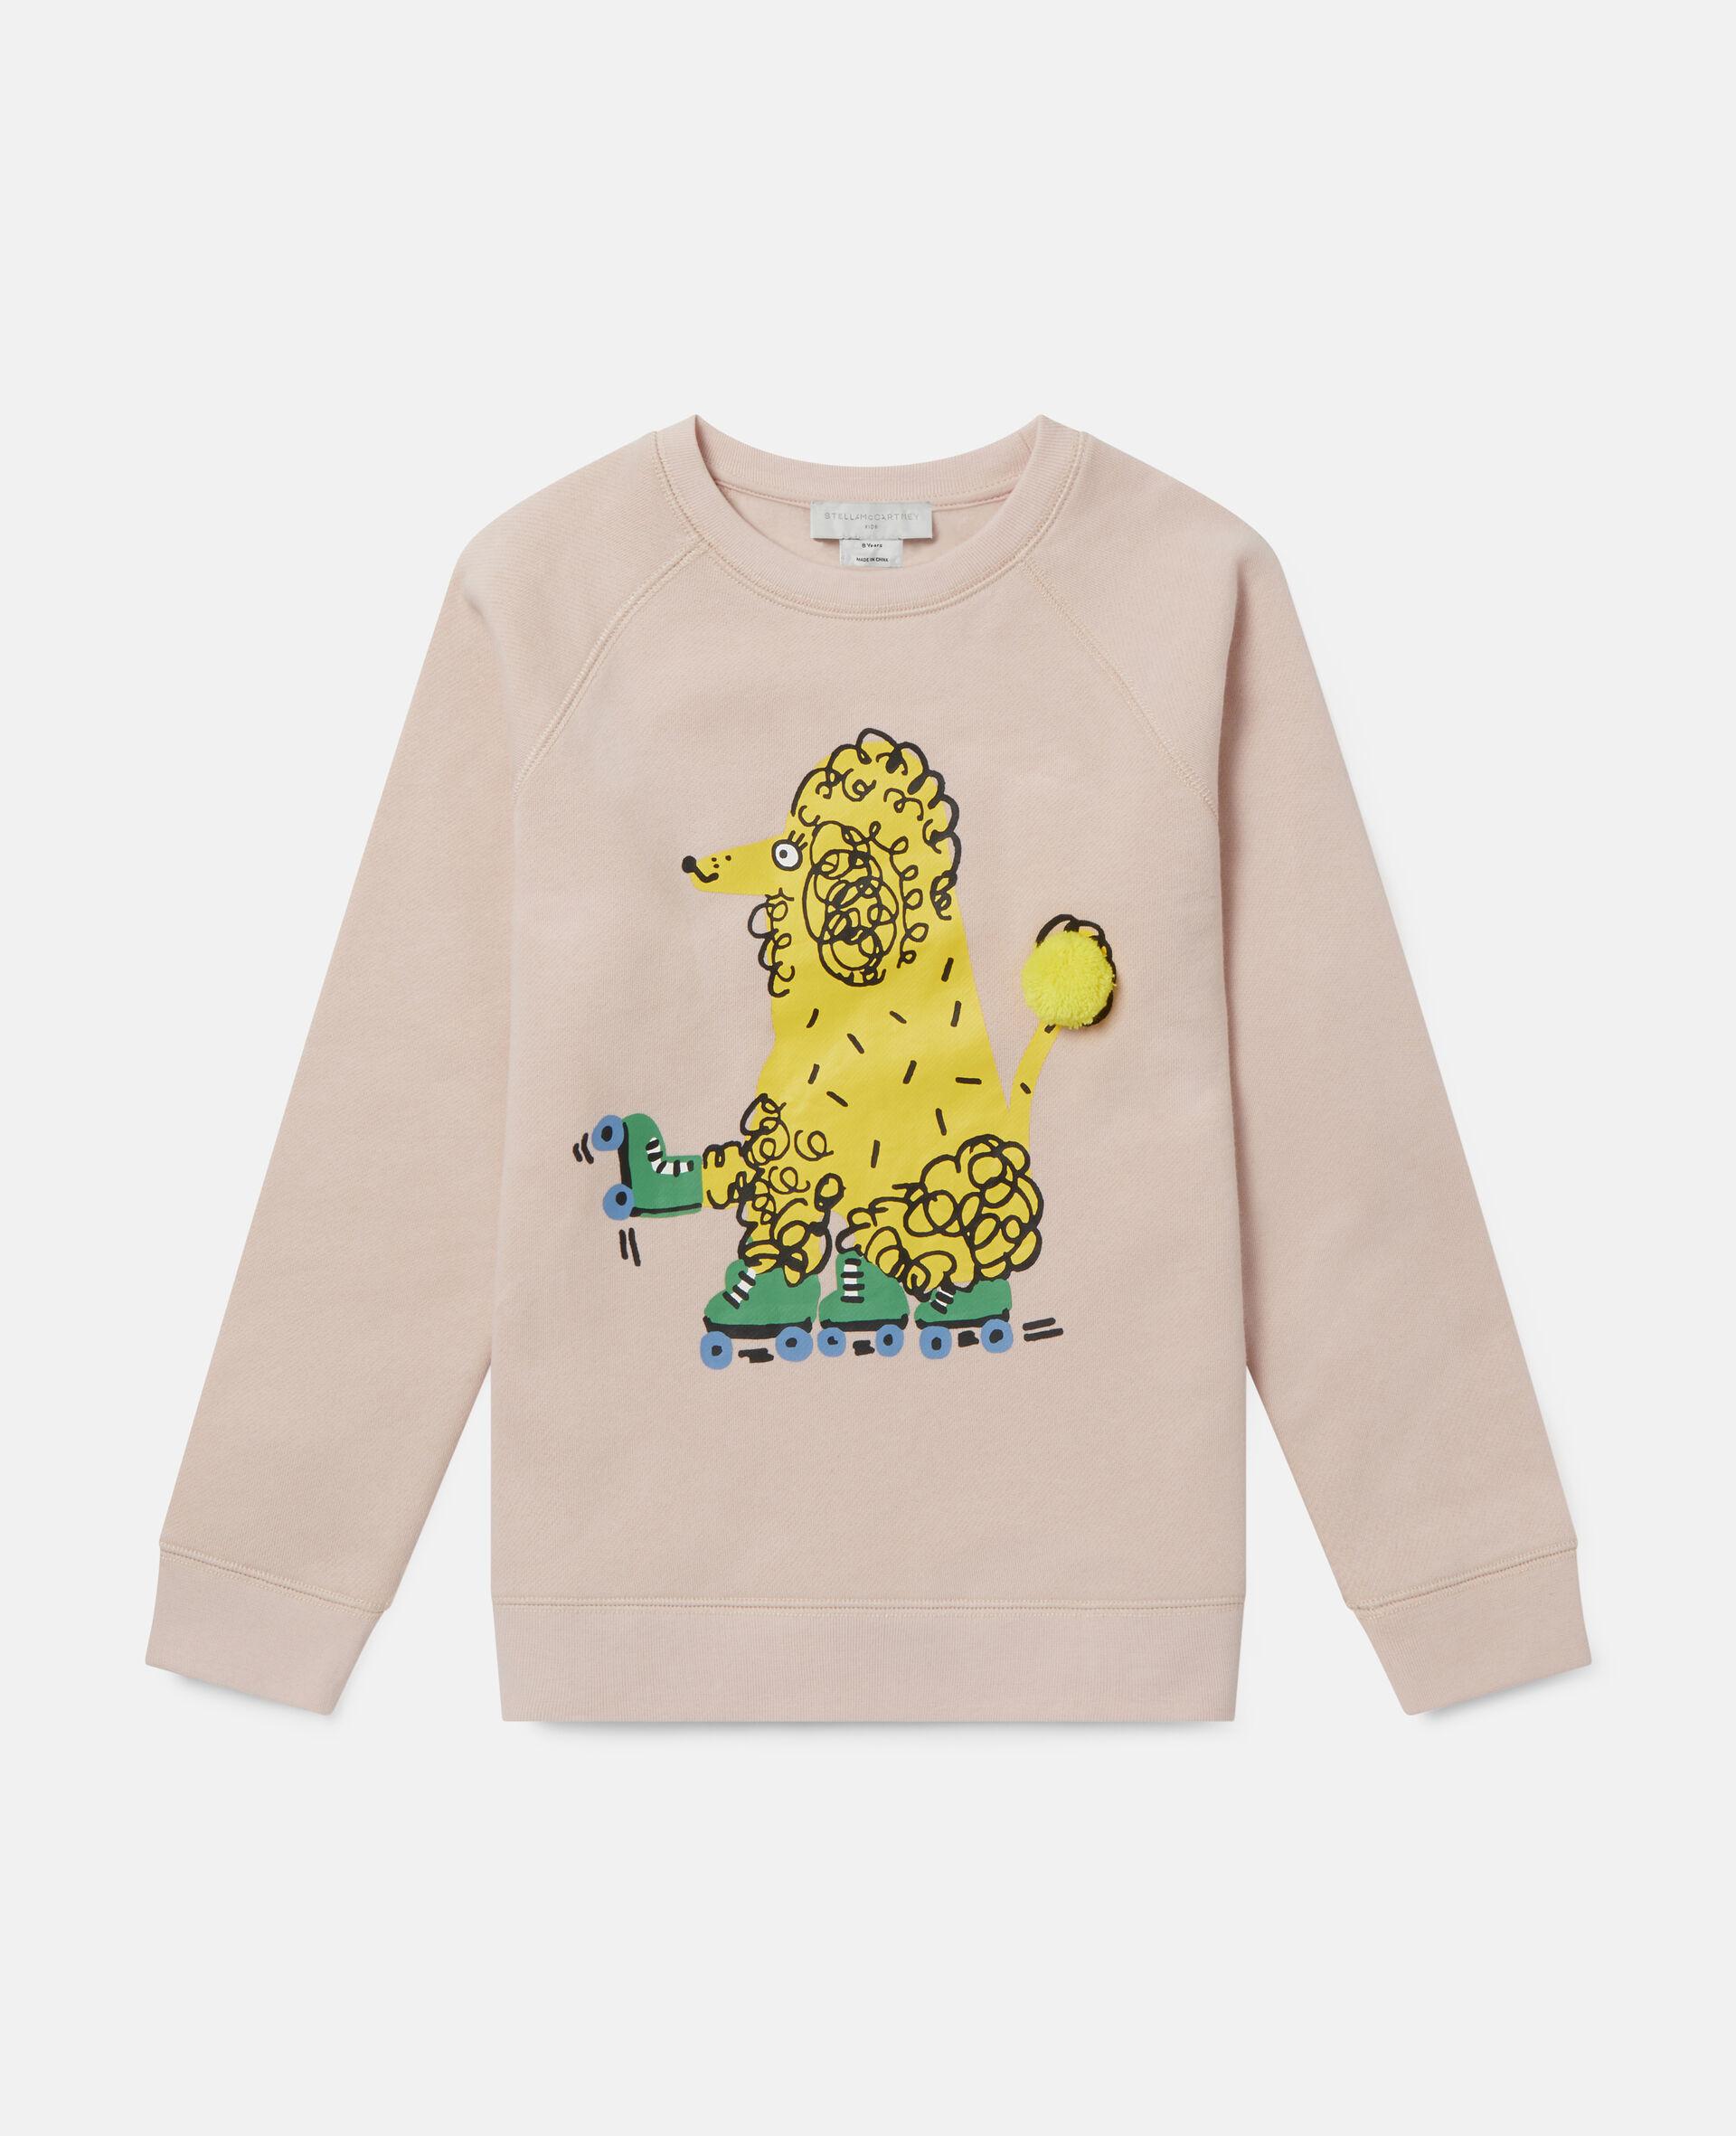 Skating Poodle Fleece Sweatshirt-Pink-large image number 0